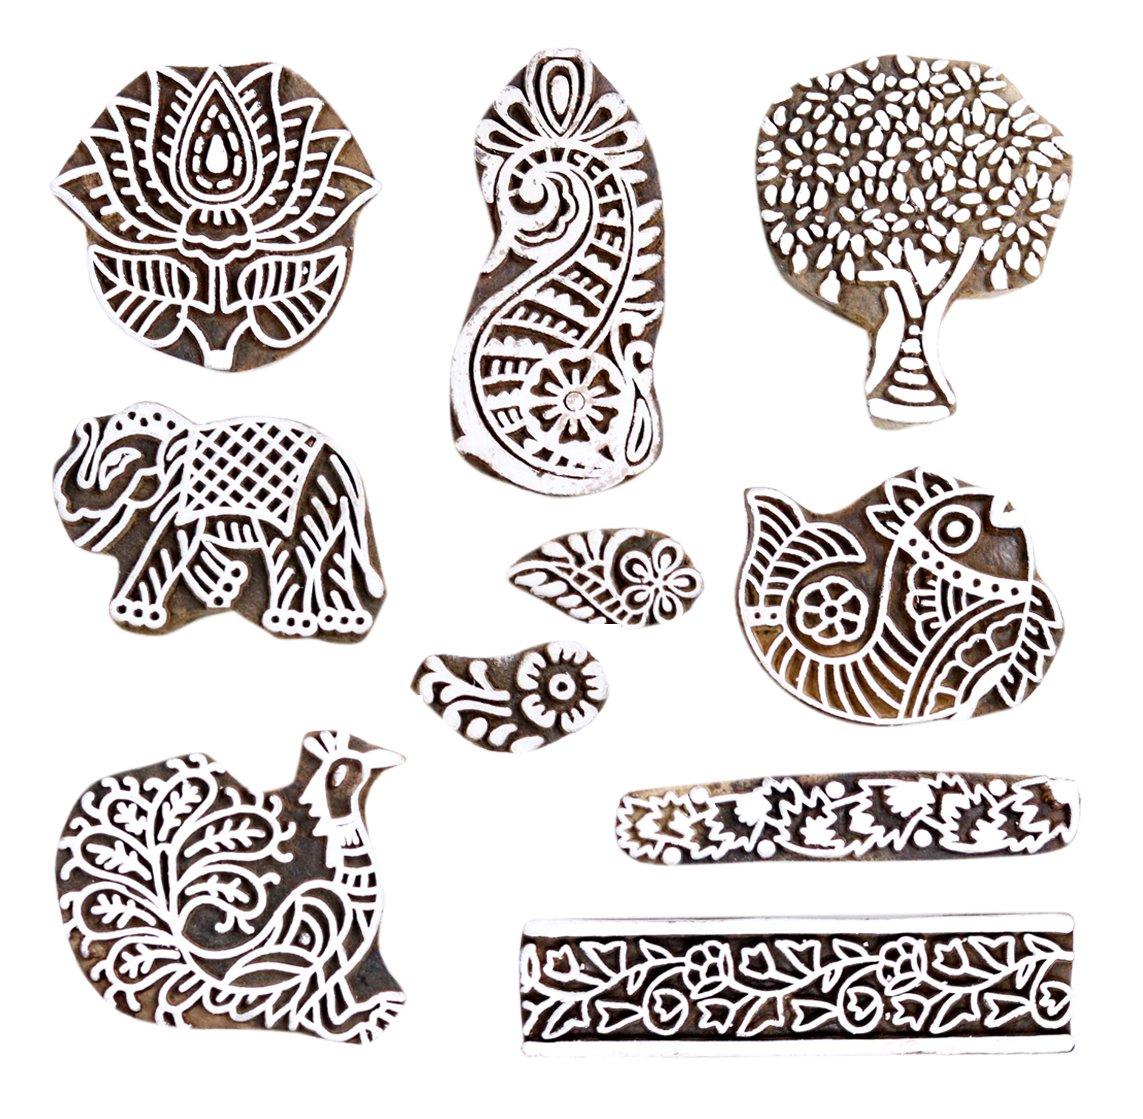 Hashcart Printing Stamps Mughal Design Wooden Blocks (Set of